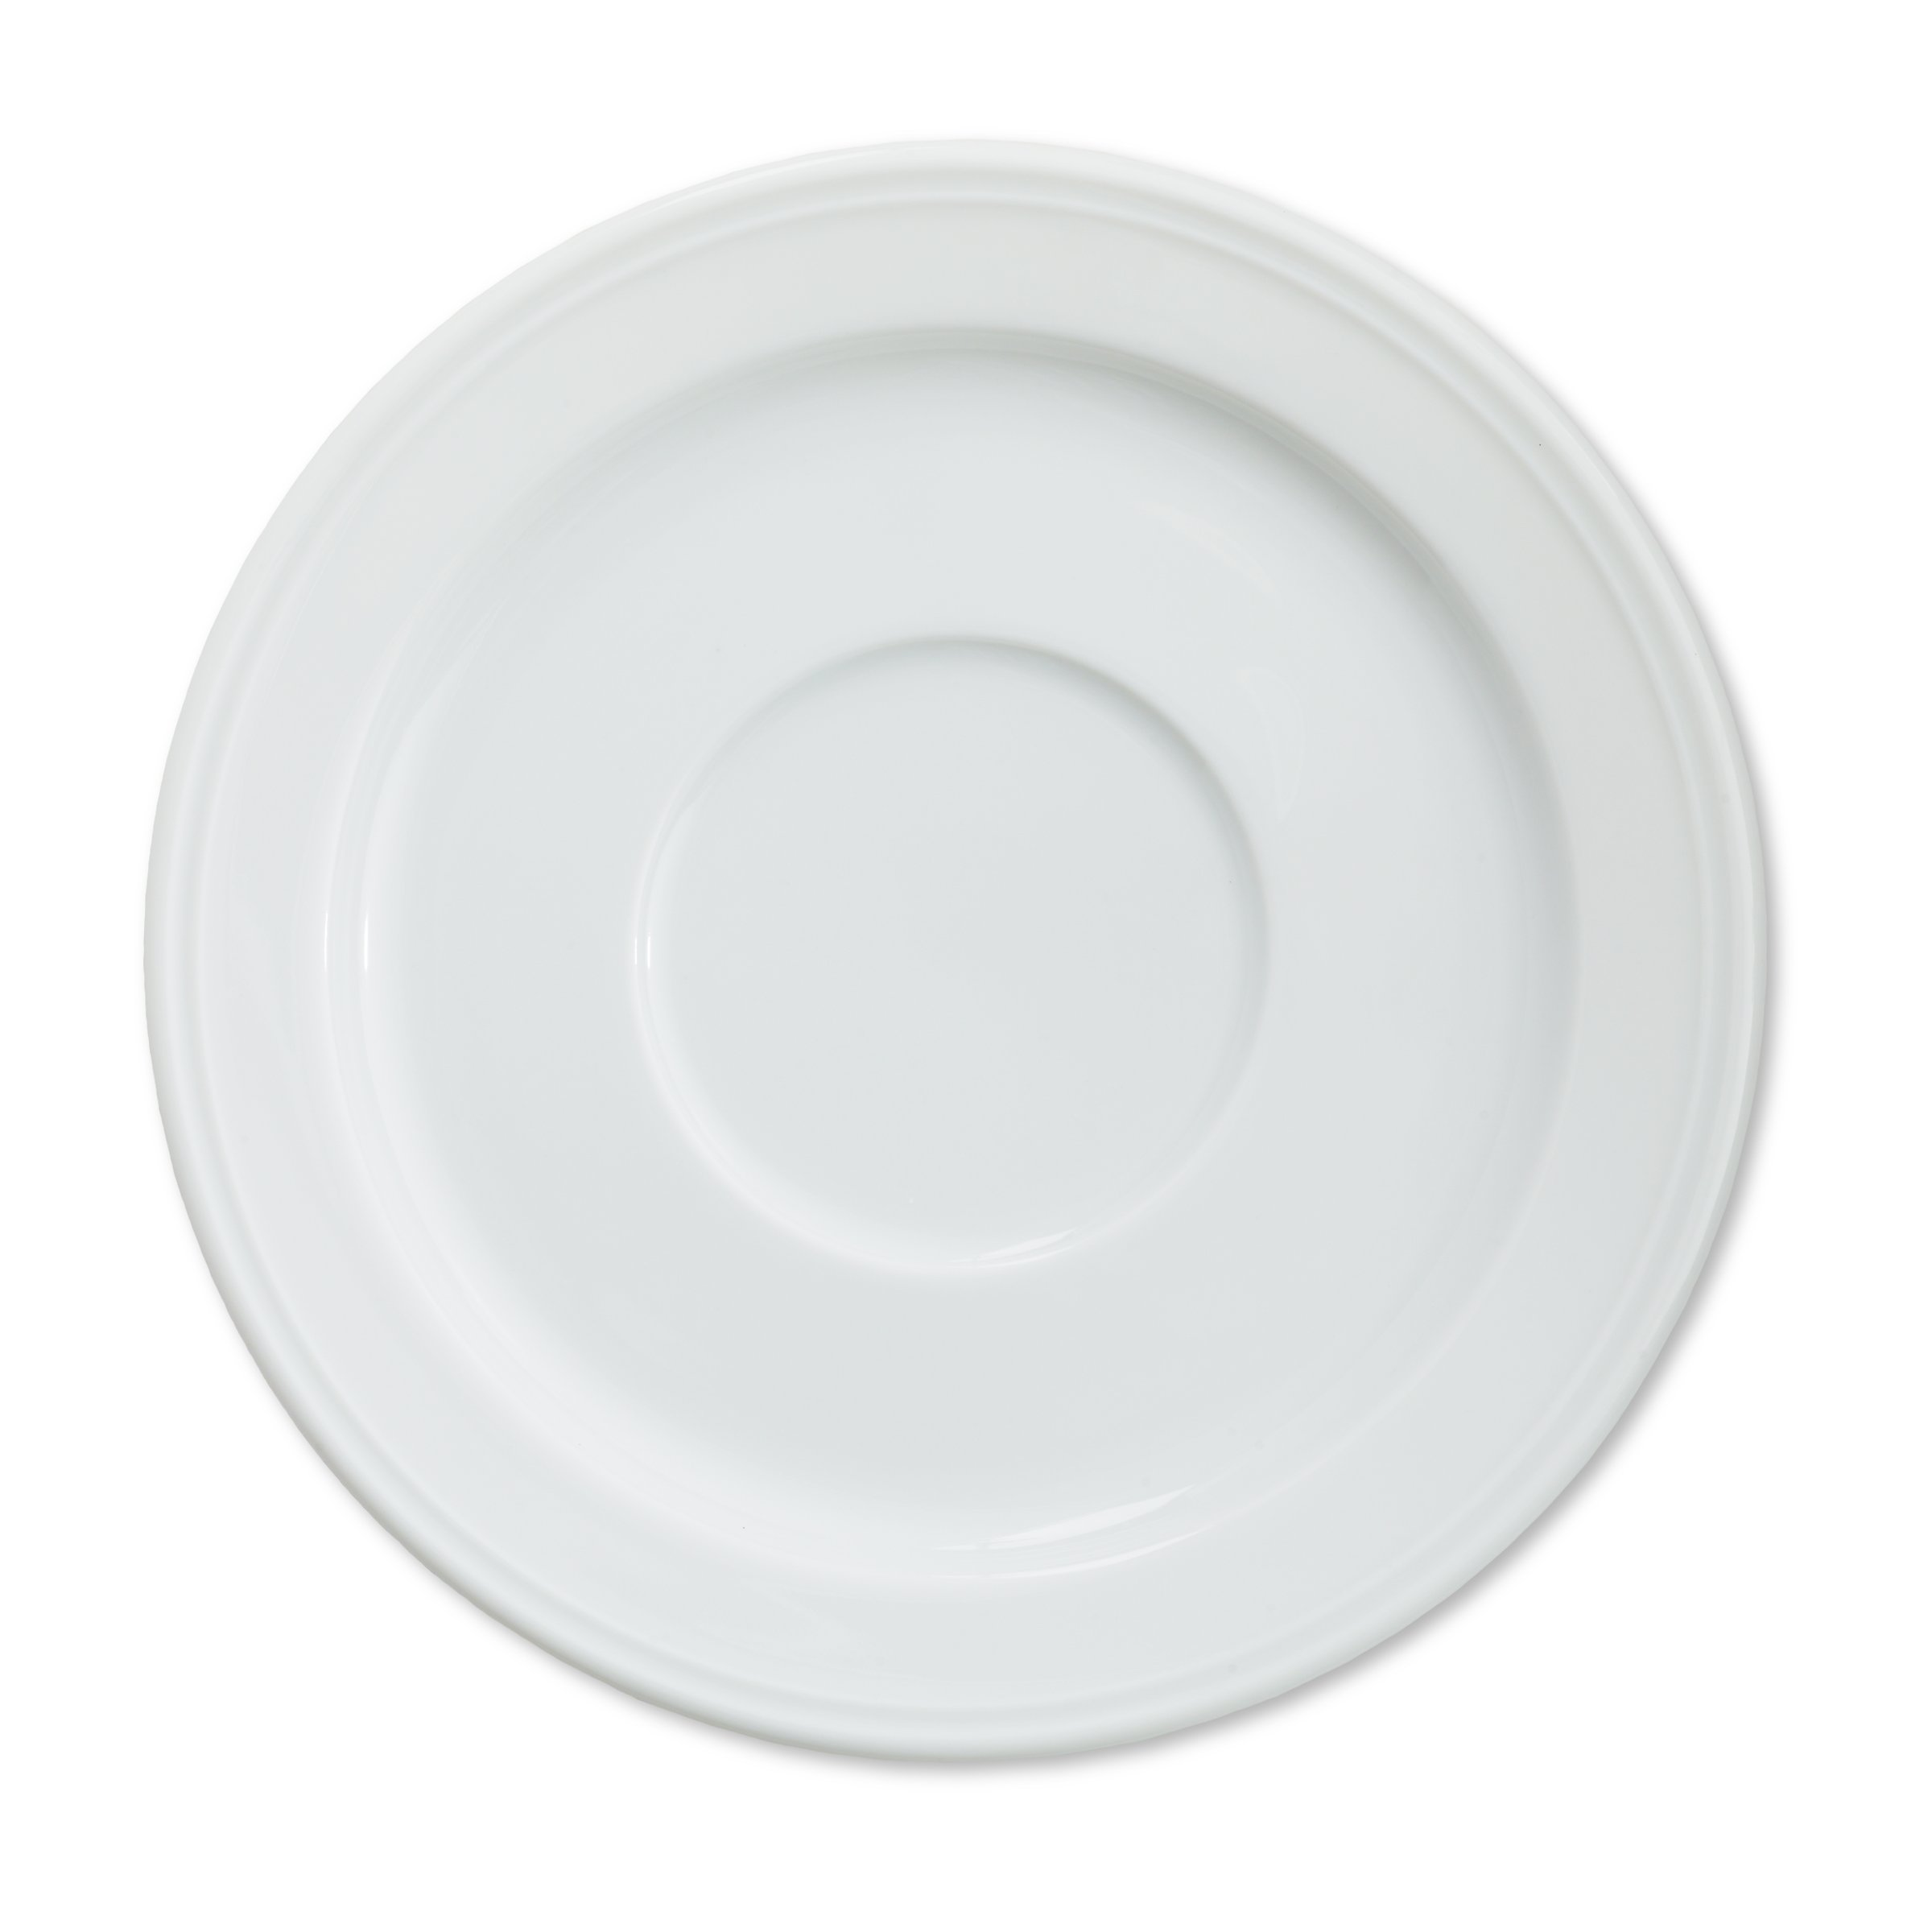 Alani, 6 3/4'' Saucer for Soup Cup, 24 per case